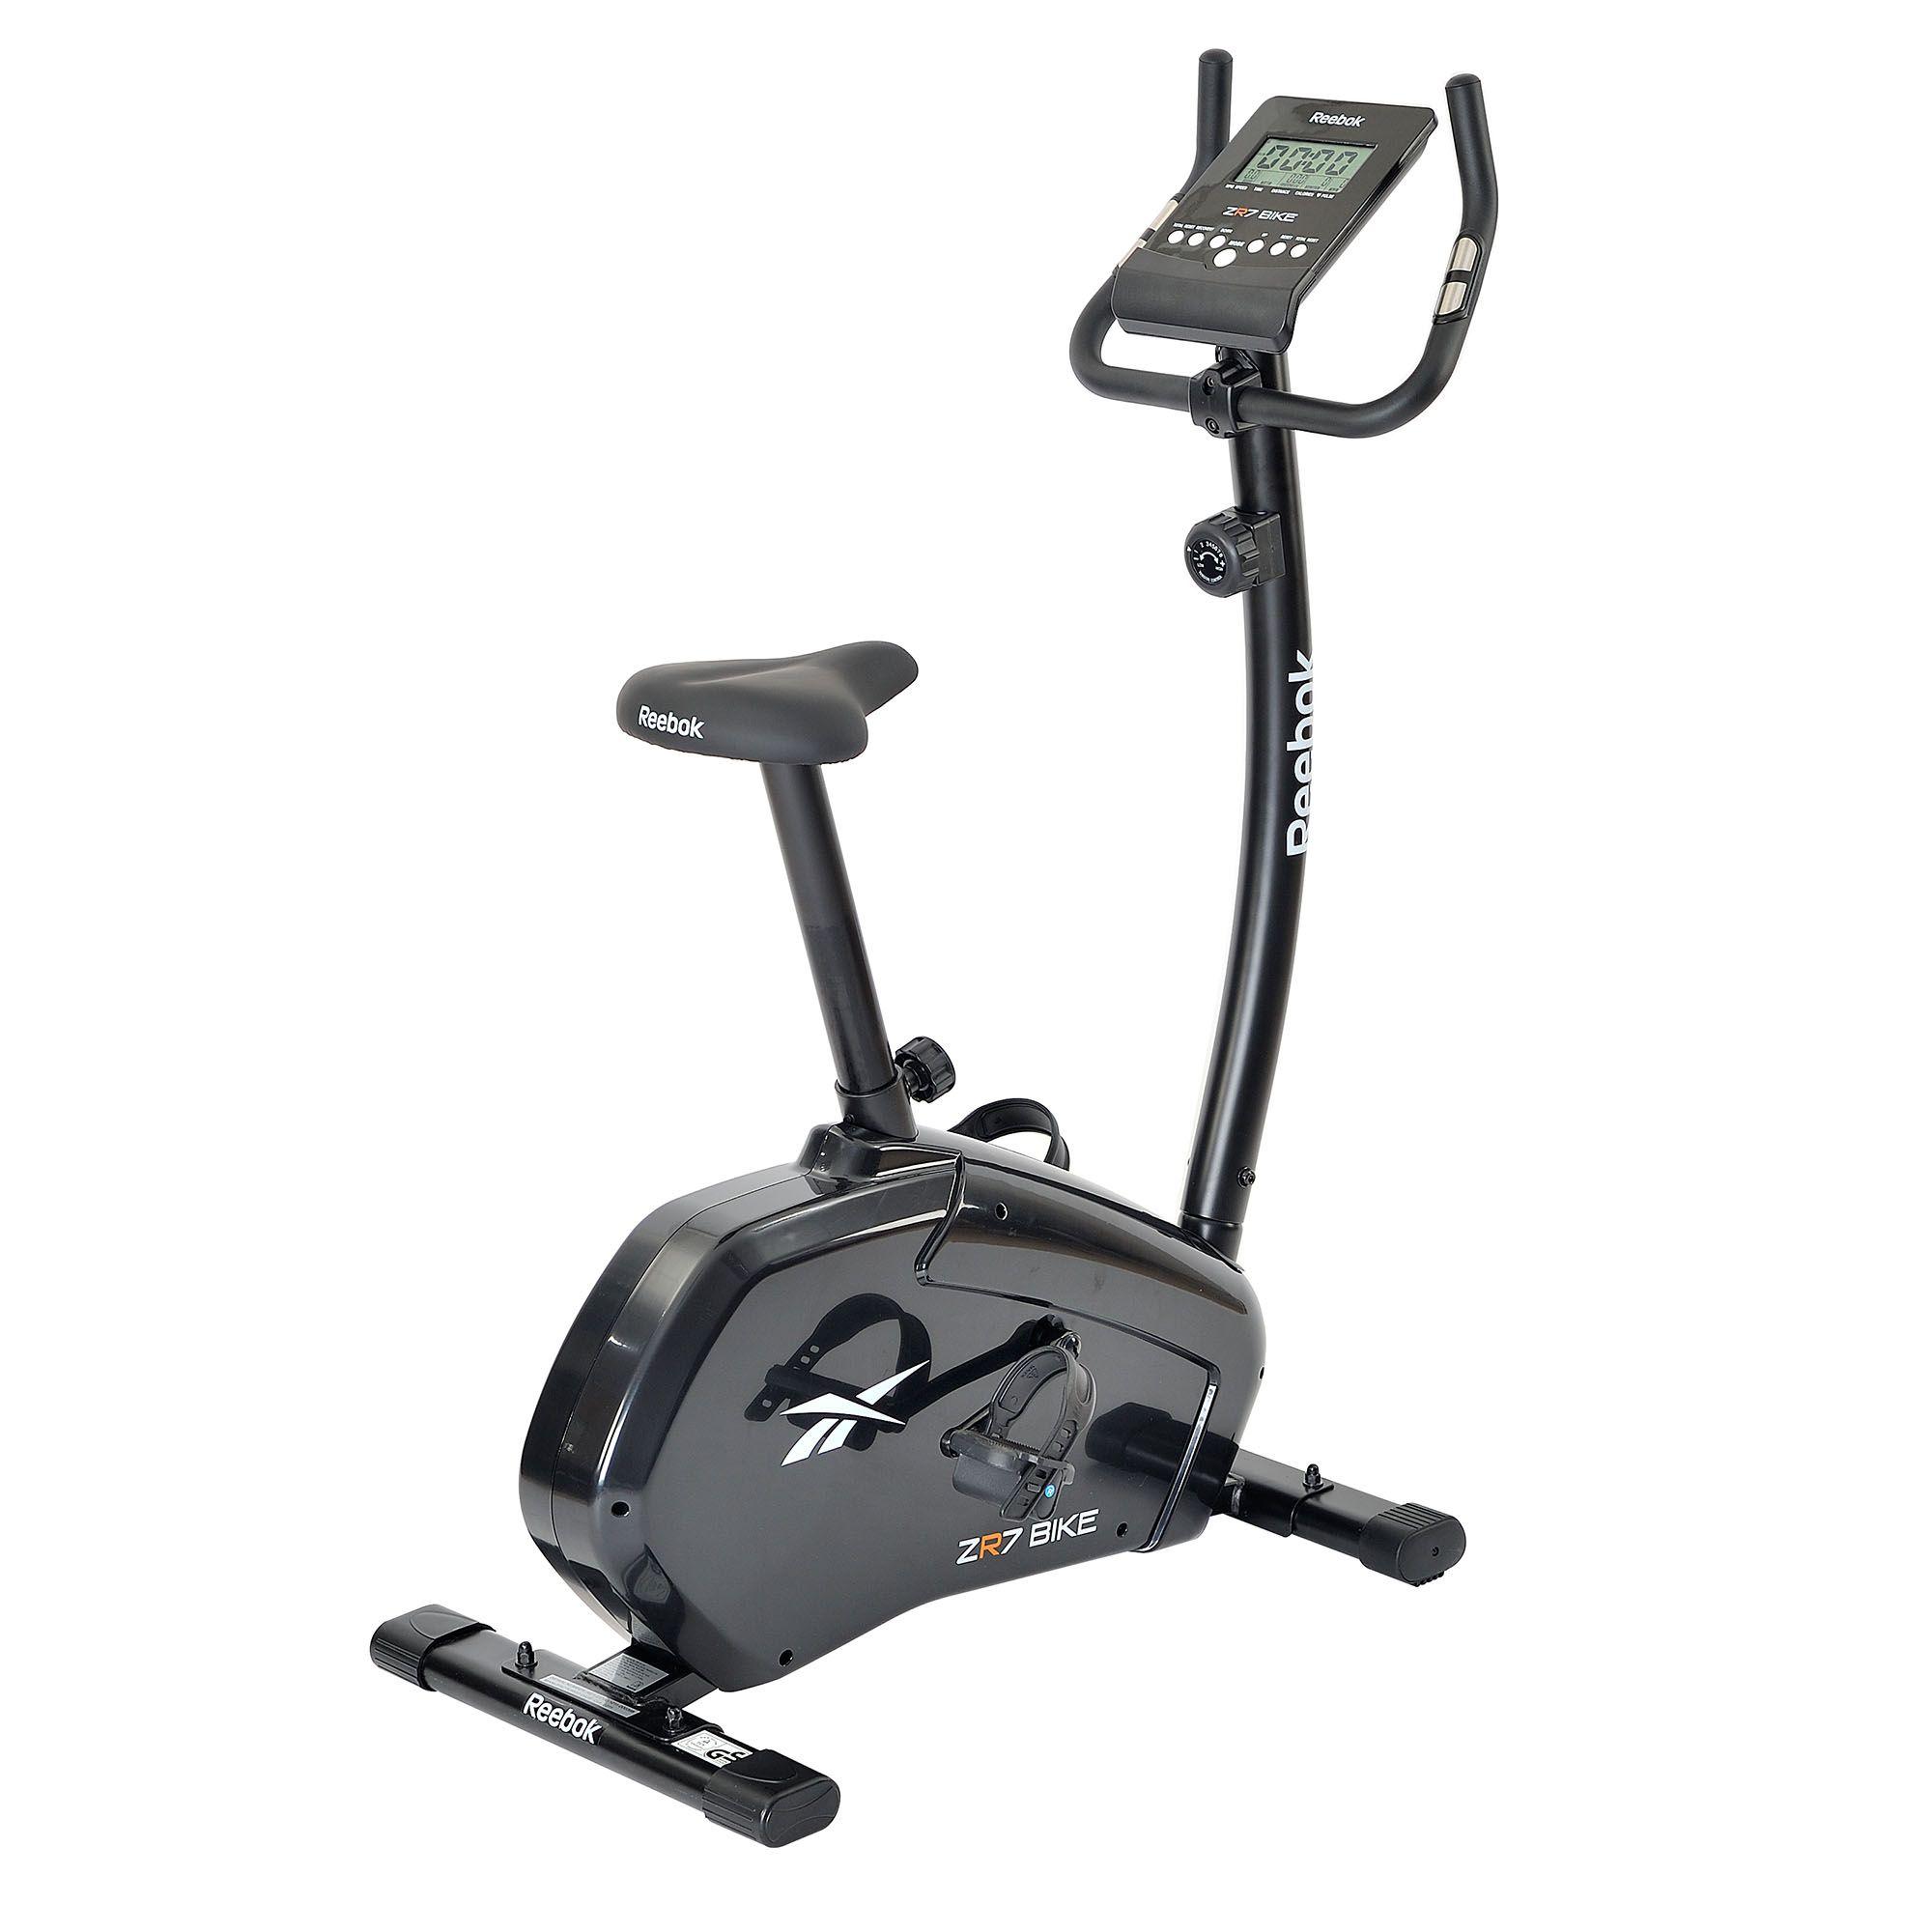 http://www.toughtrain.com/wp-content/uploads/2013/06/Exercise-Bike.jpg